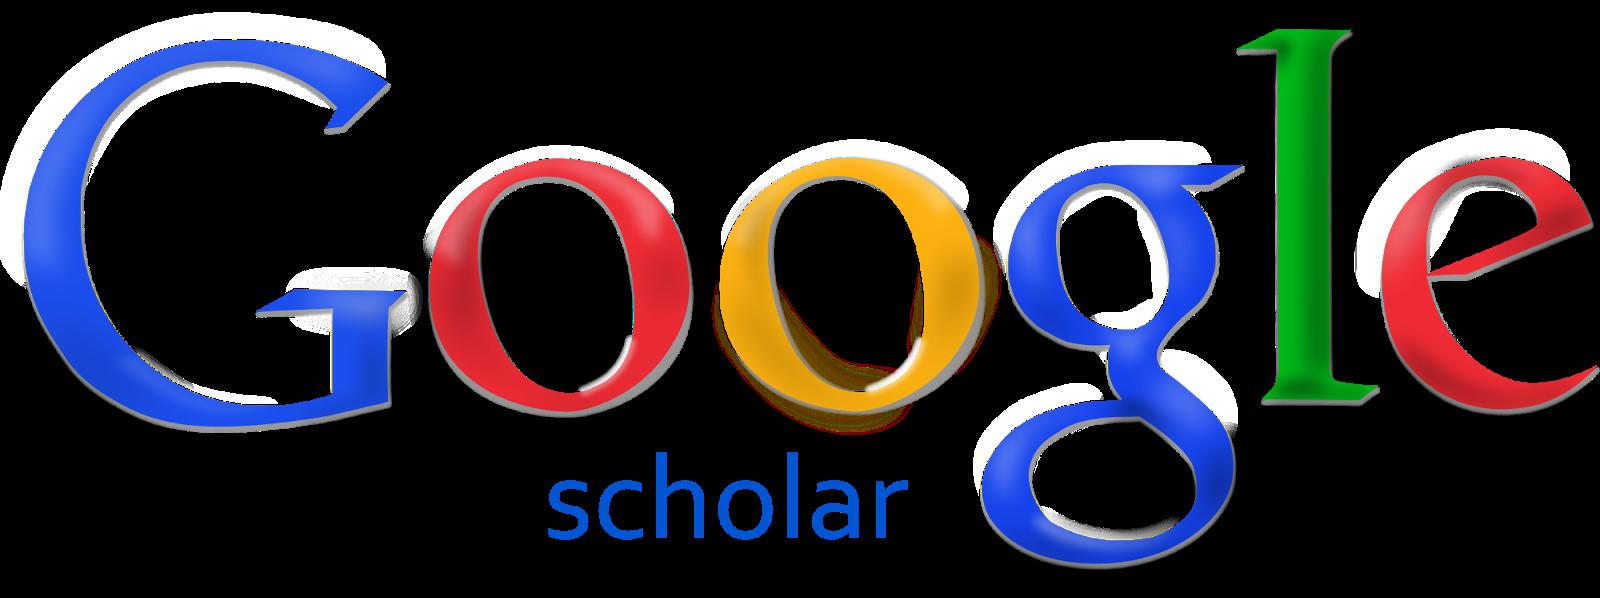 Google Schoolar